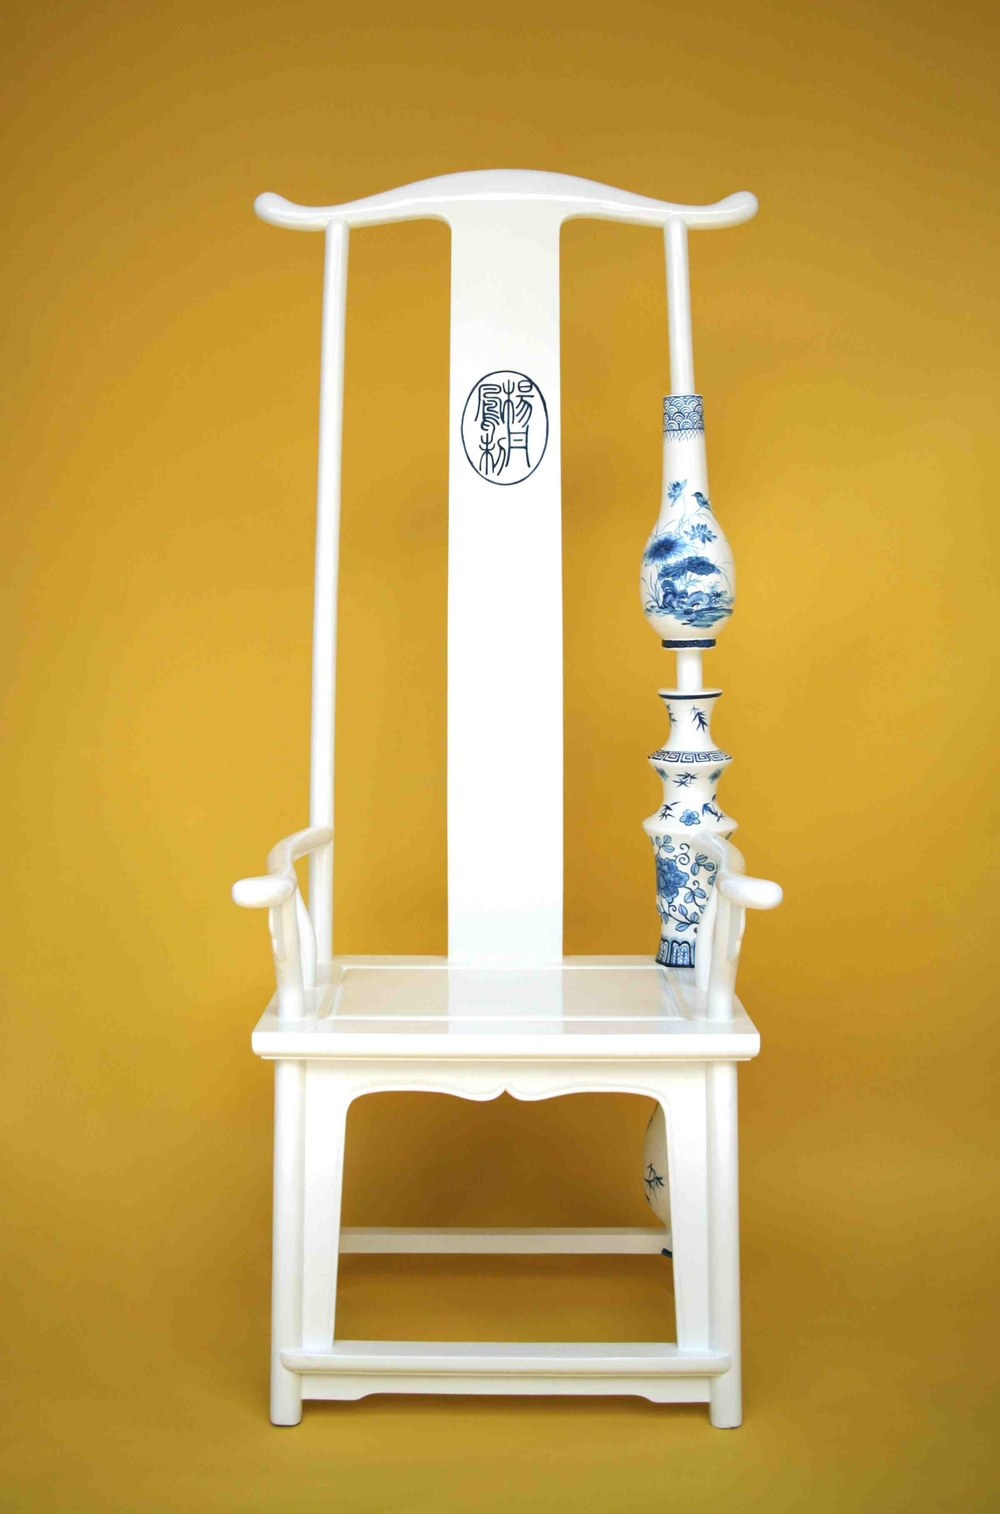 vase chair.jpg